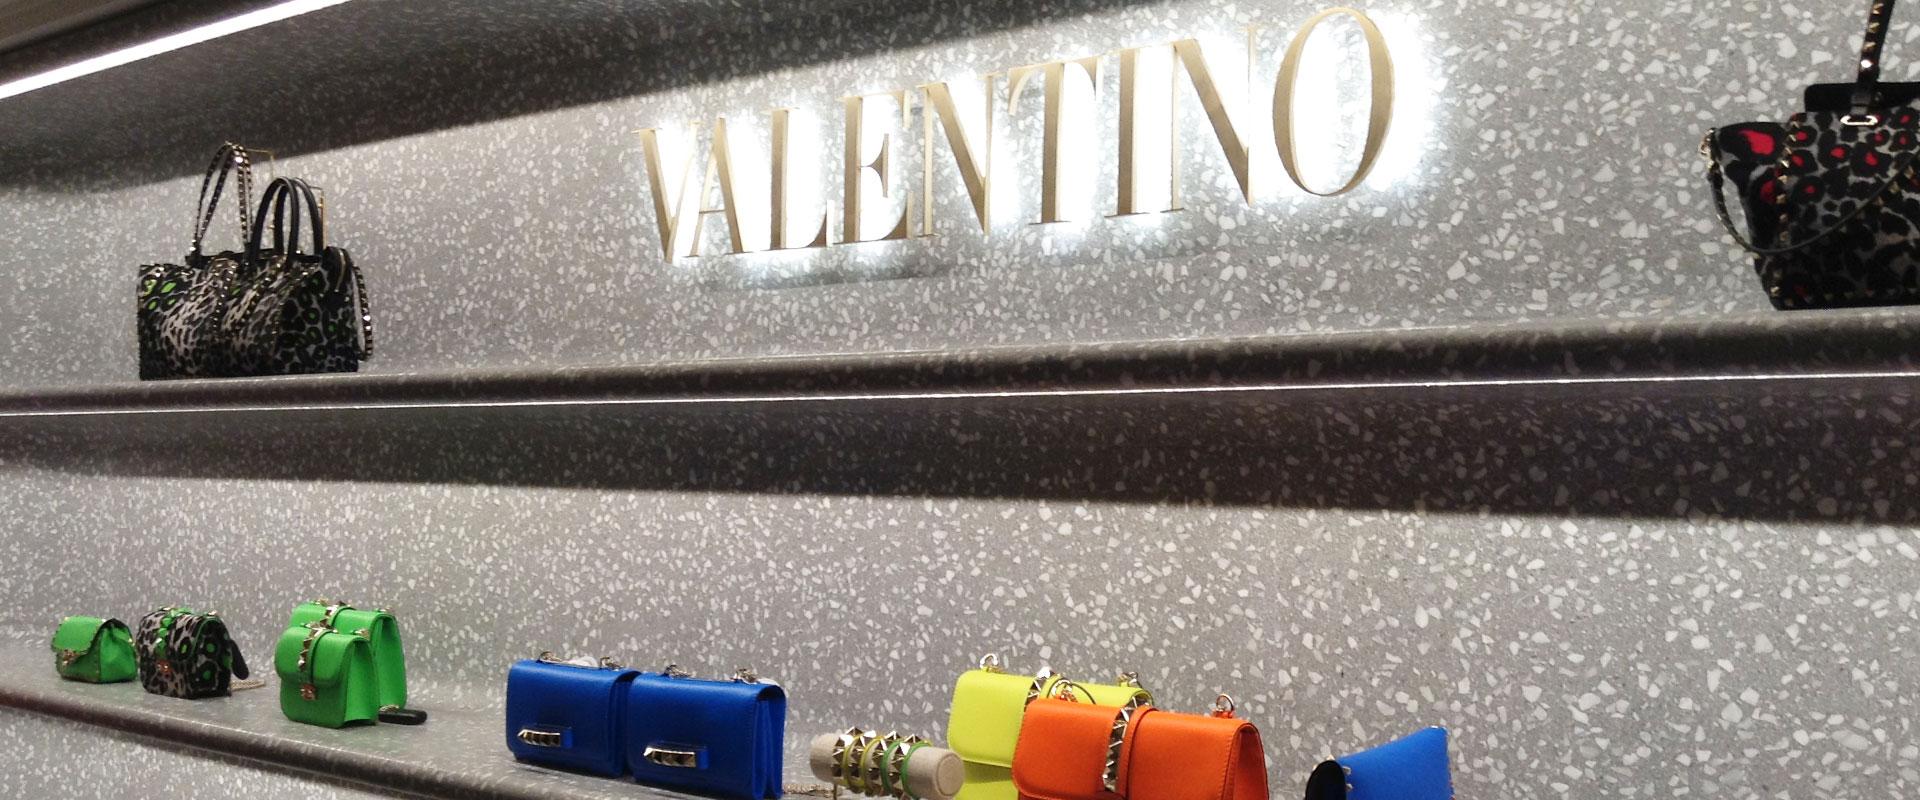 Valentino-harrods-london-united-kingdom-custom-10-OK